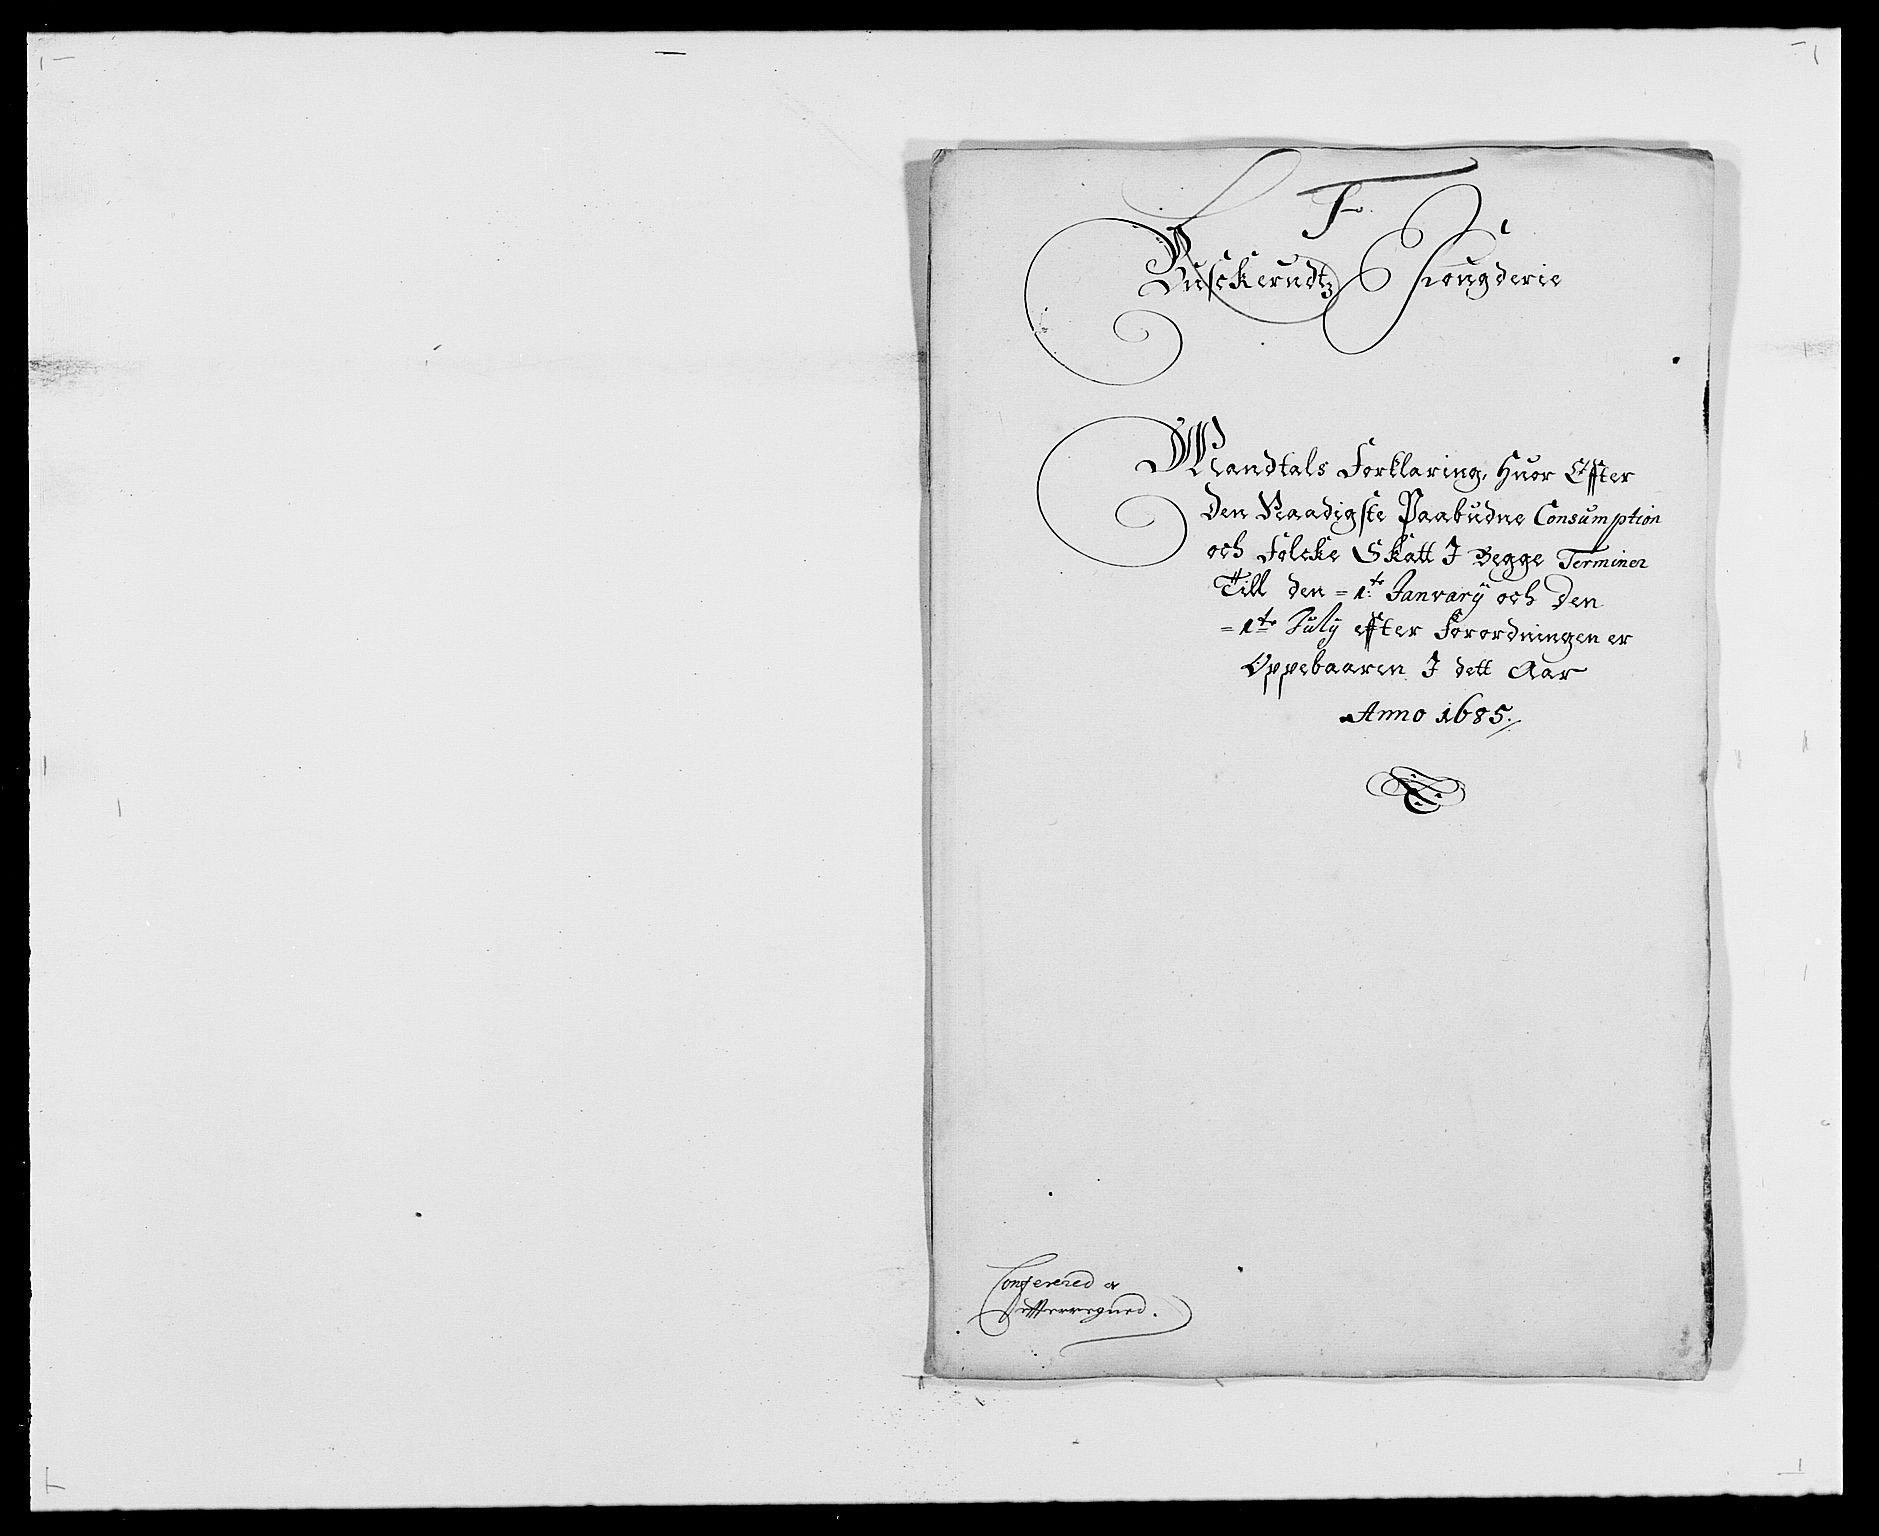 RA, Rentekammeret inntil 1814, Reviderte regnskaper, Fogderegnskap, R25/L1678: Fogderegnskap Buskerud, 1685-1686, s. 114